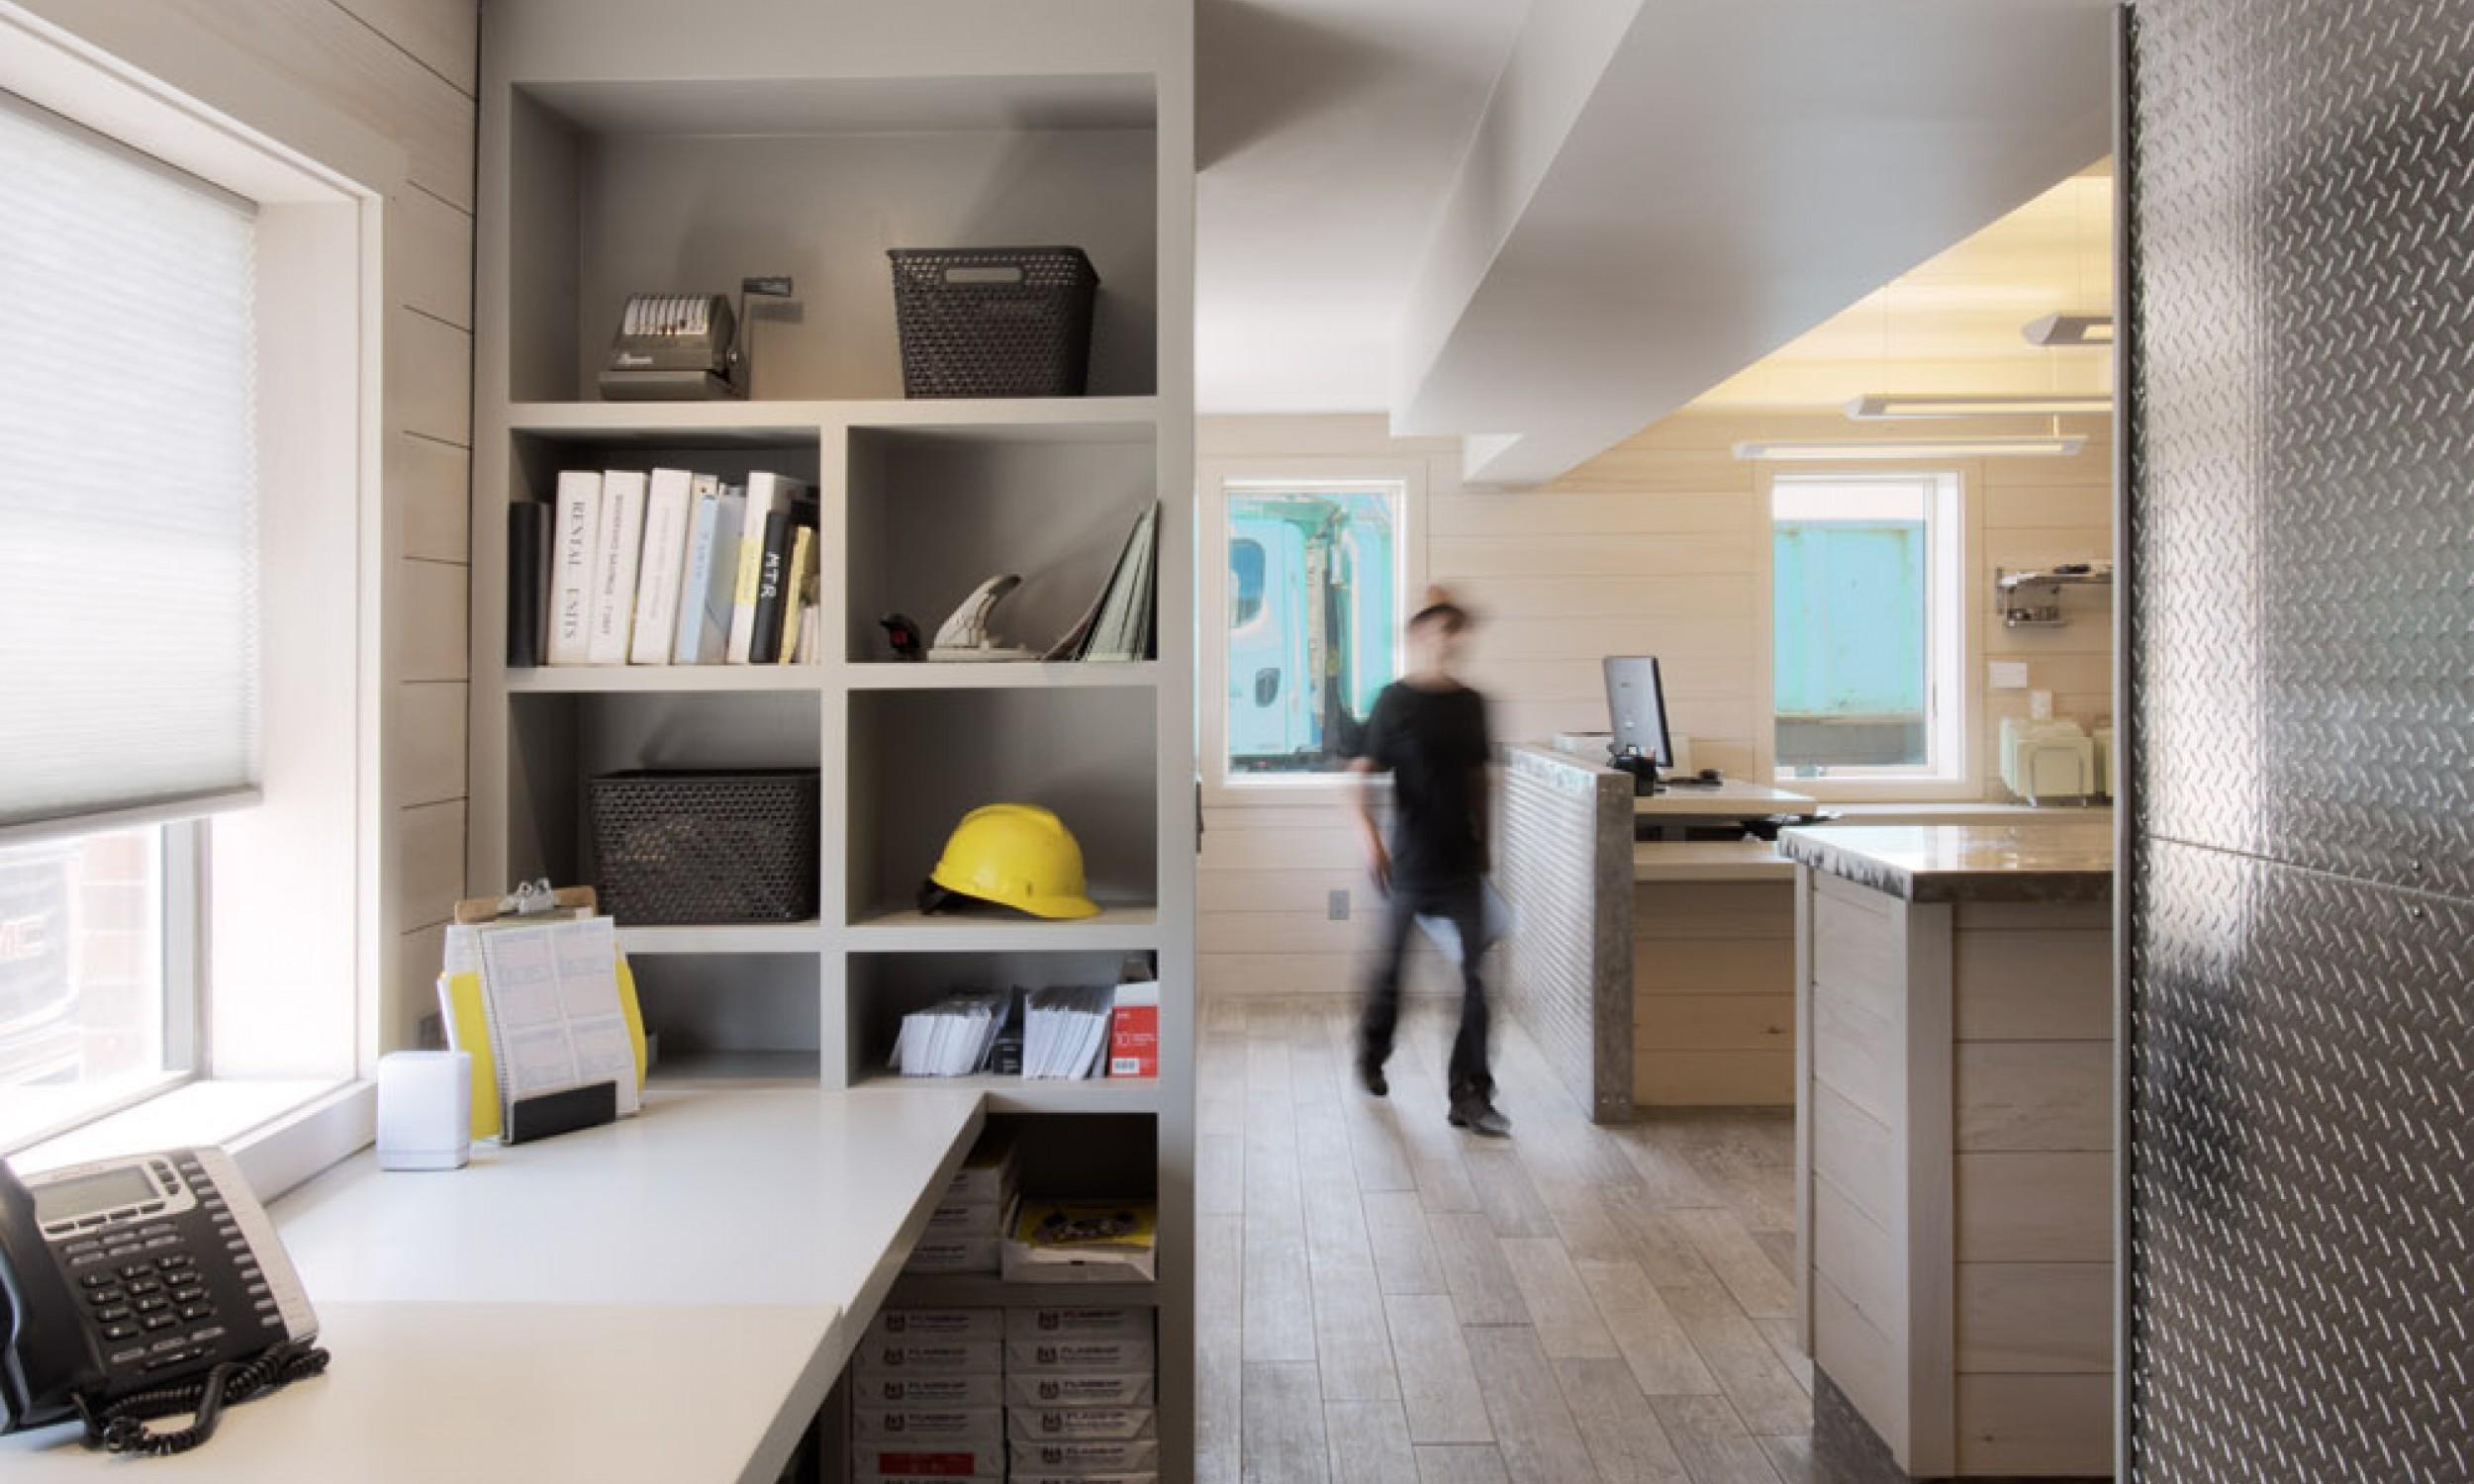 Procelain tile floor, custom cabinets, Maine Architect, Diamond Plate